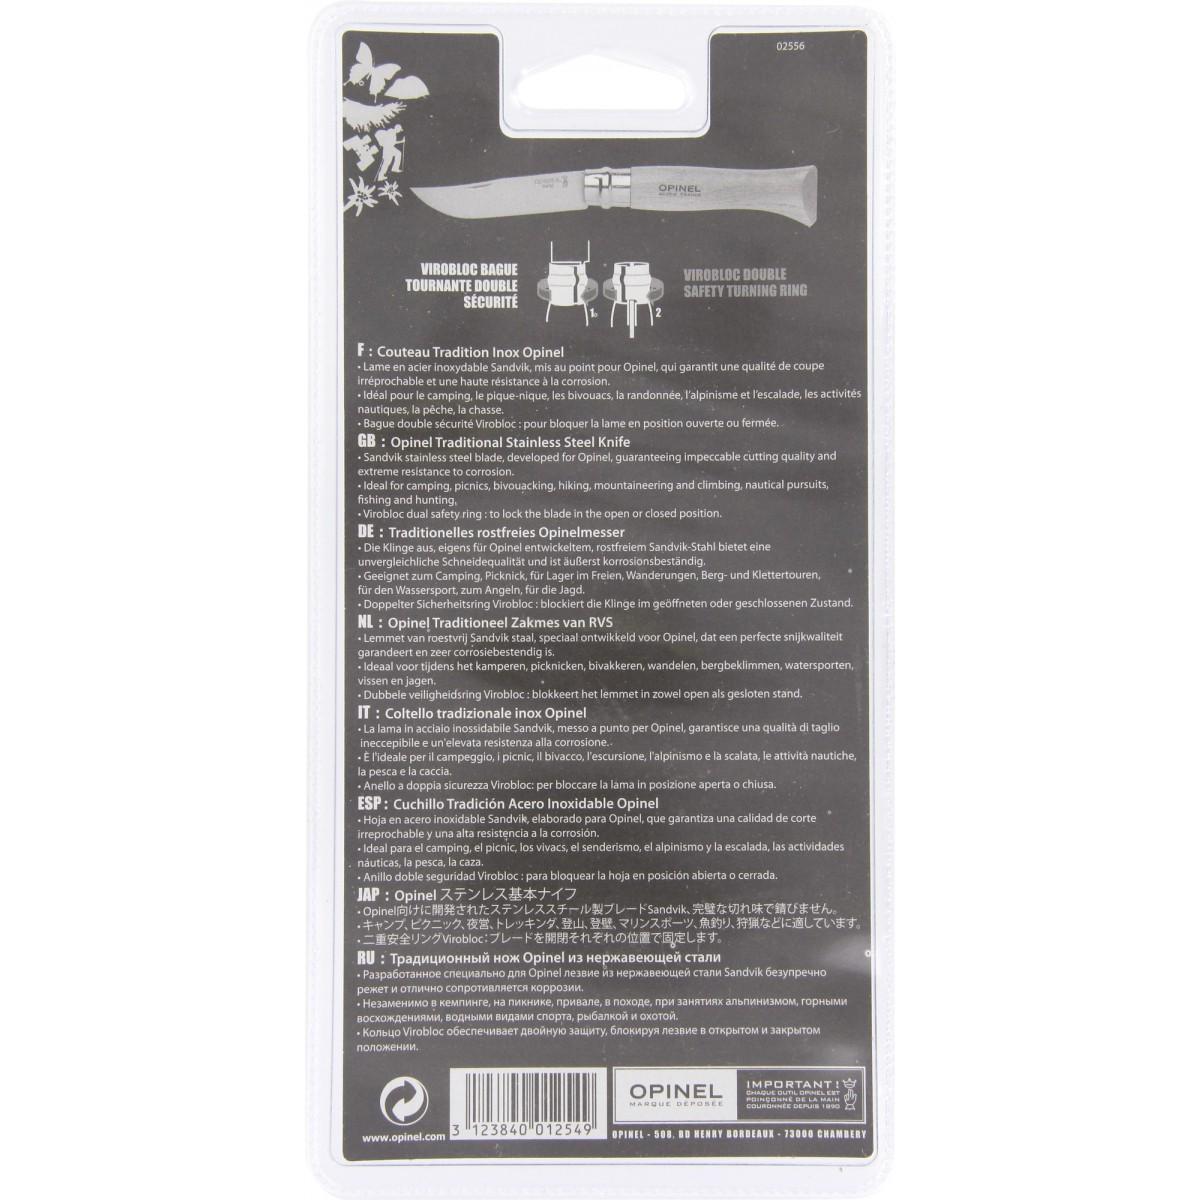 Couteau lame inox Opinel - Longueur lame 9 cm - N°9